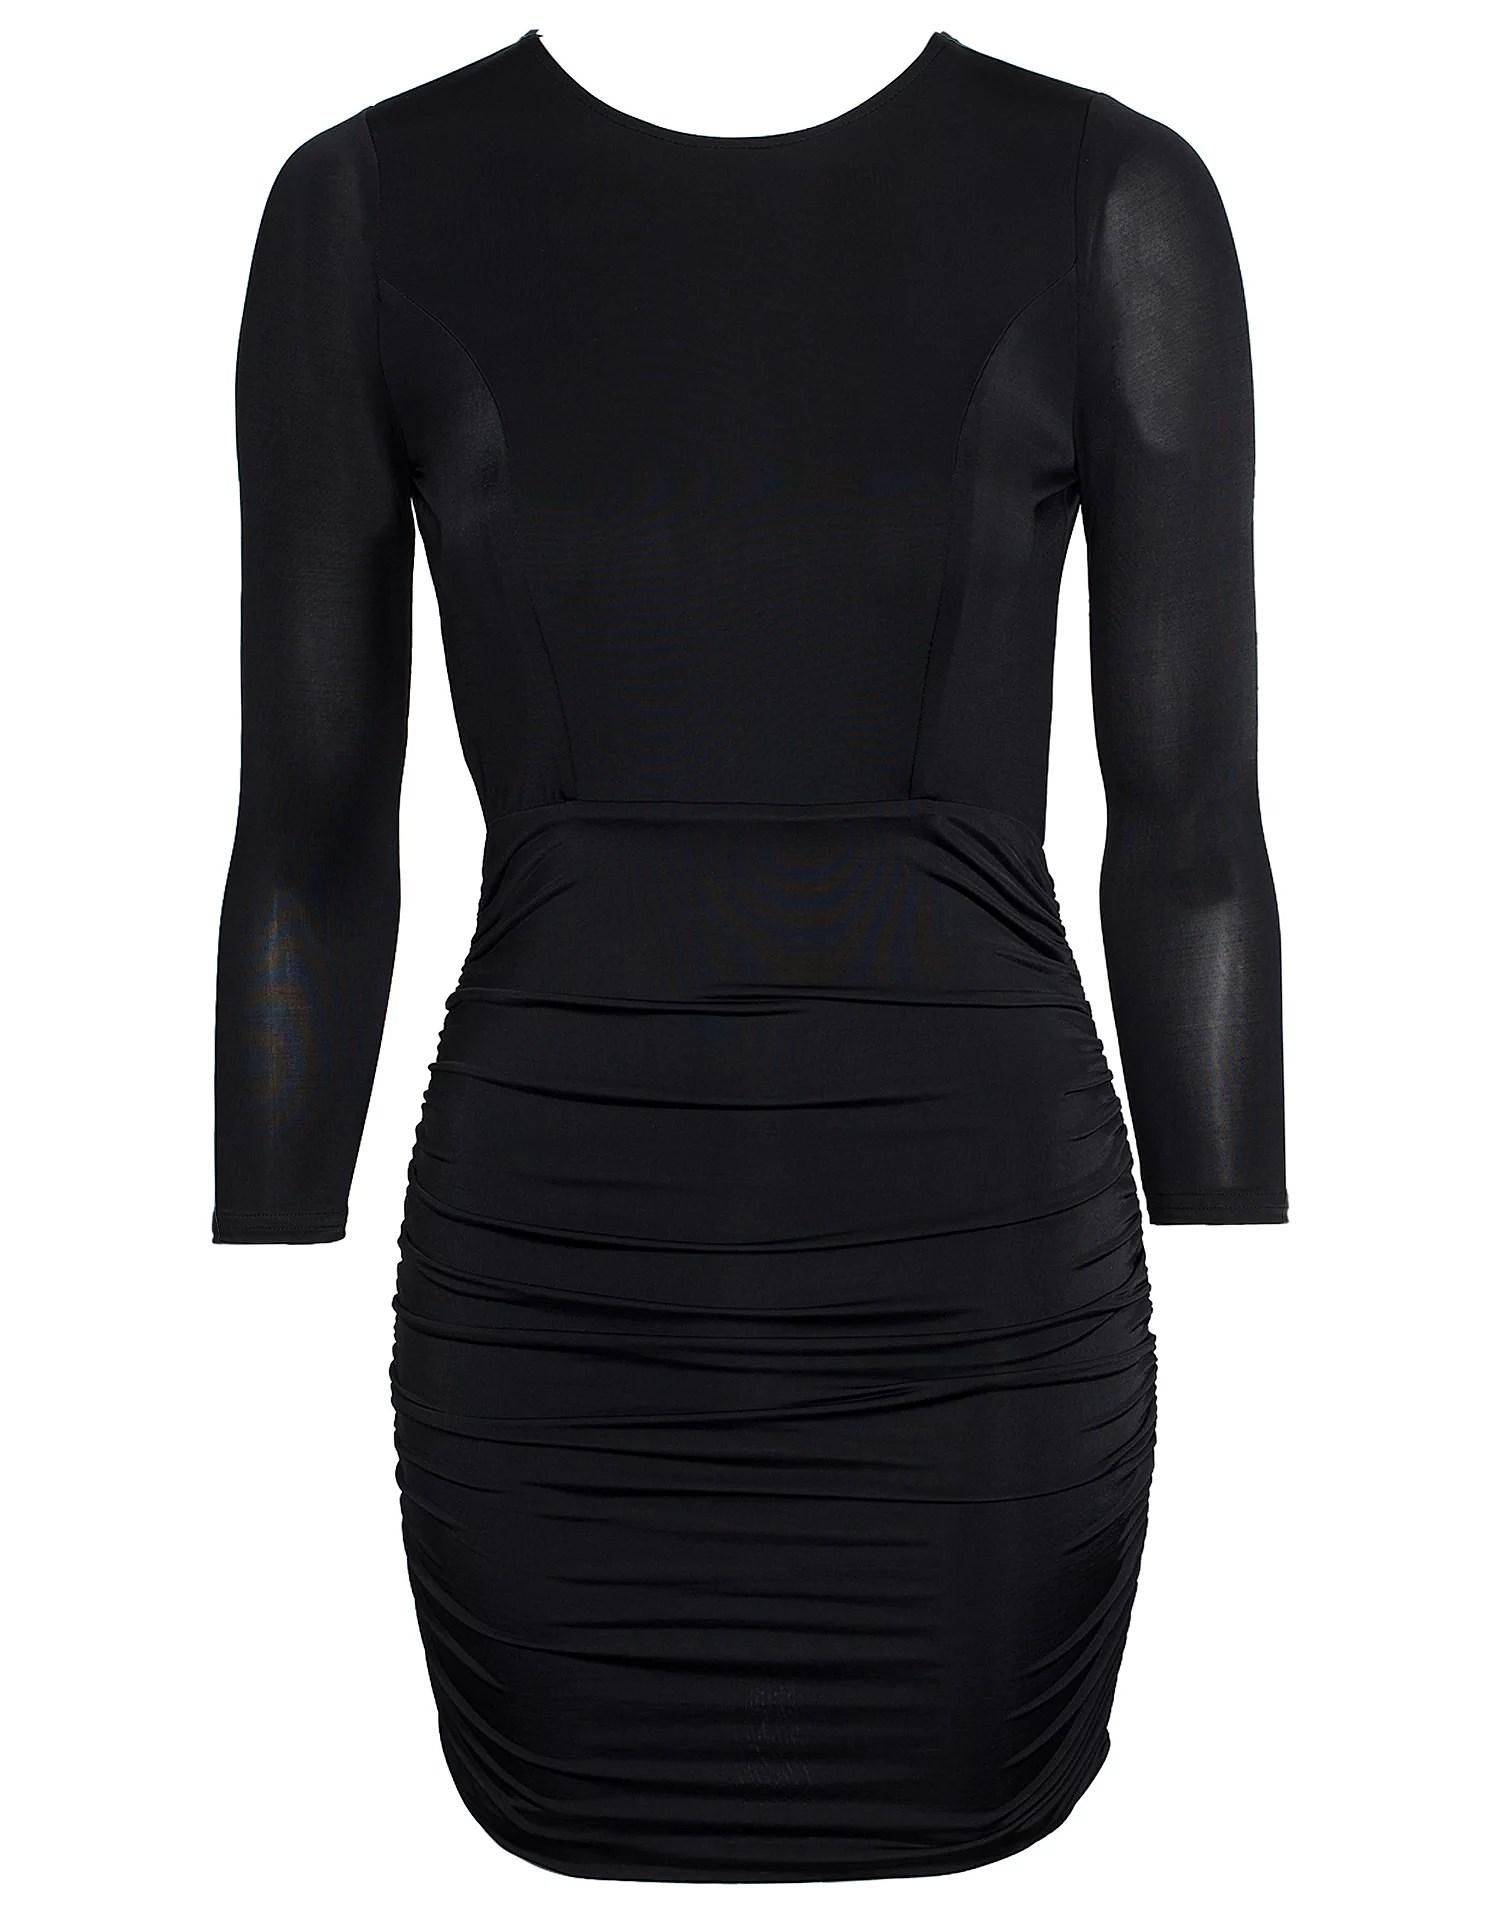 NEW YEAR DRESS, BLACK